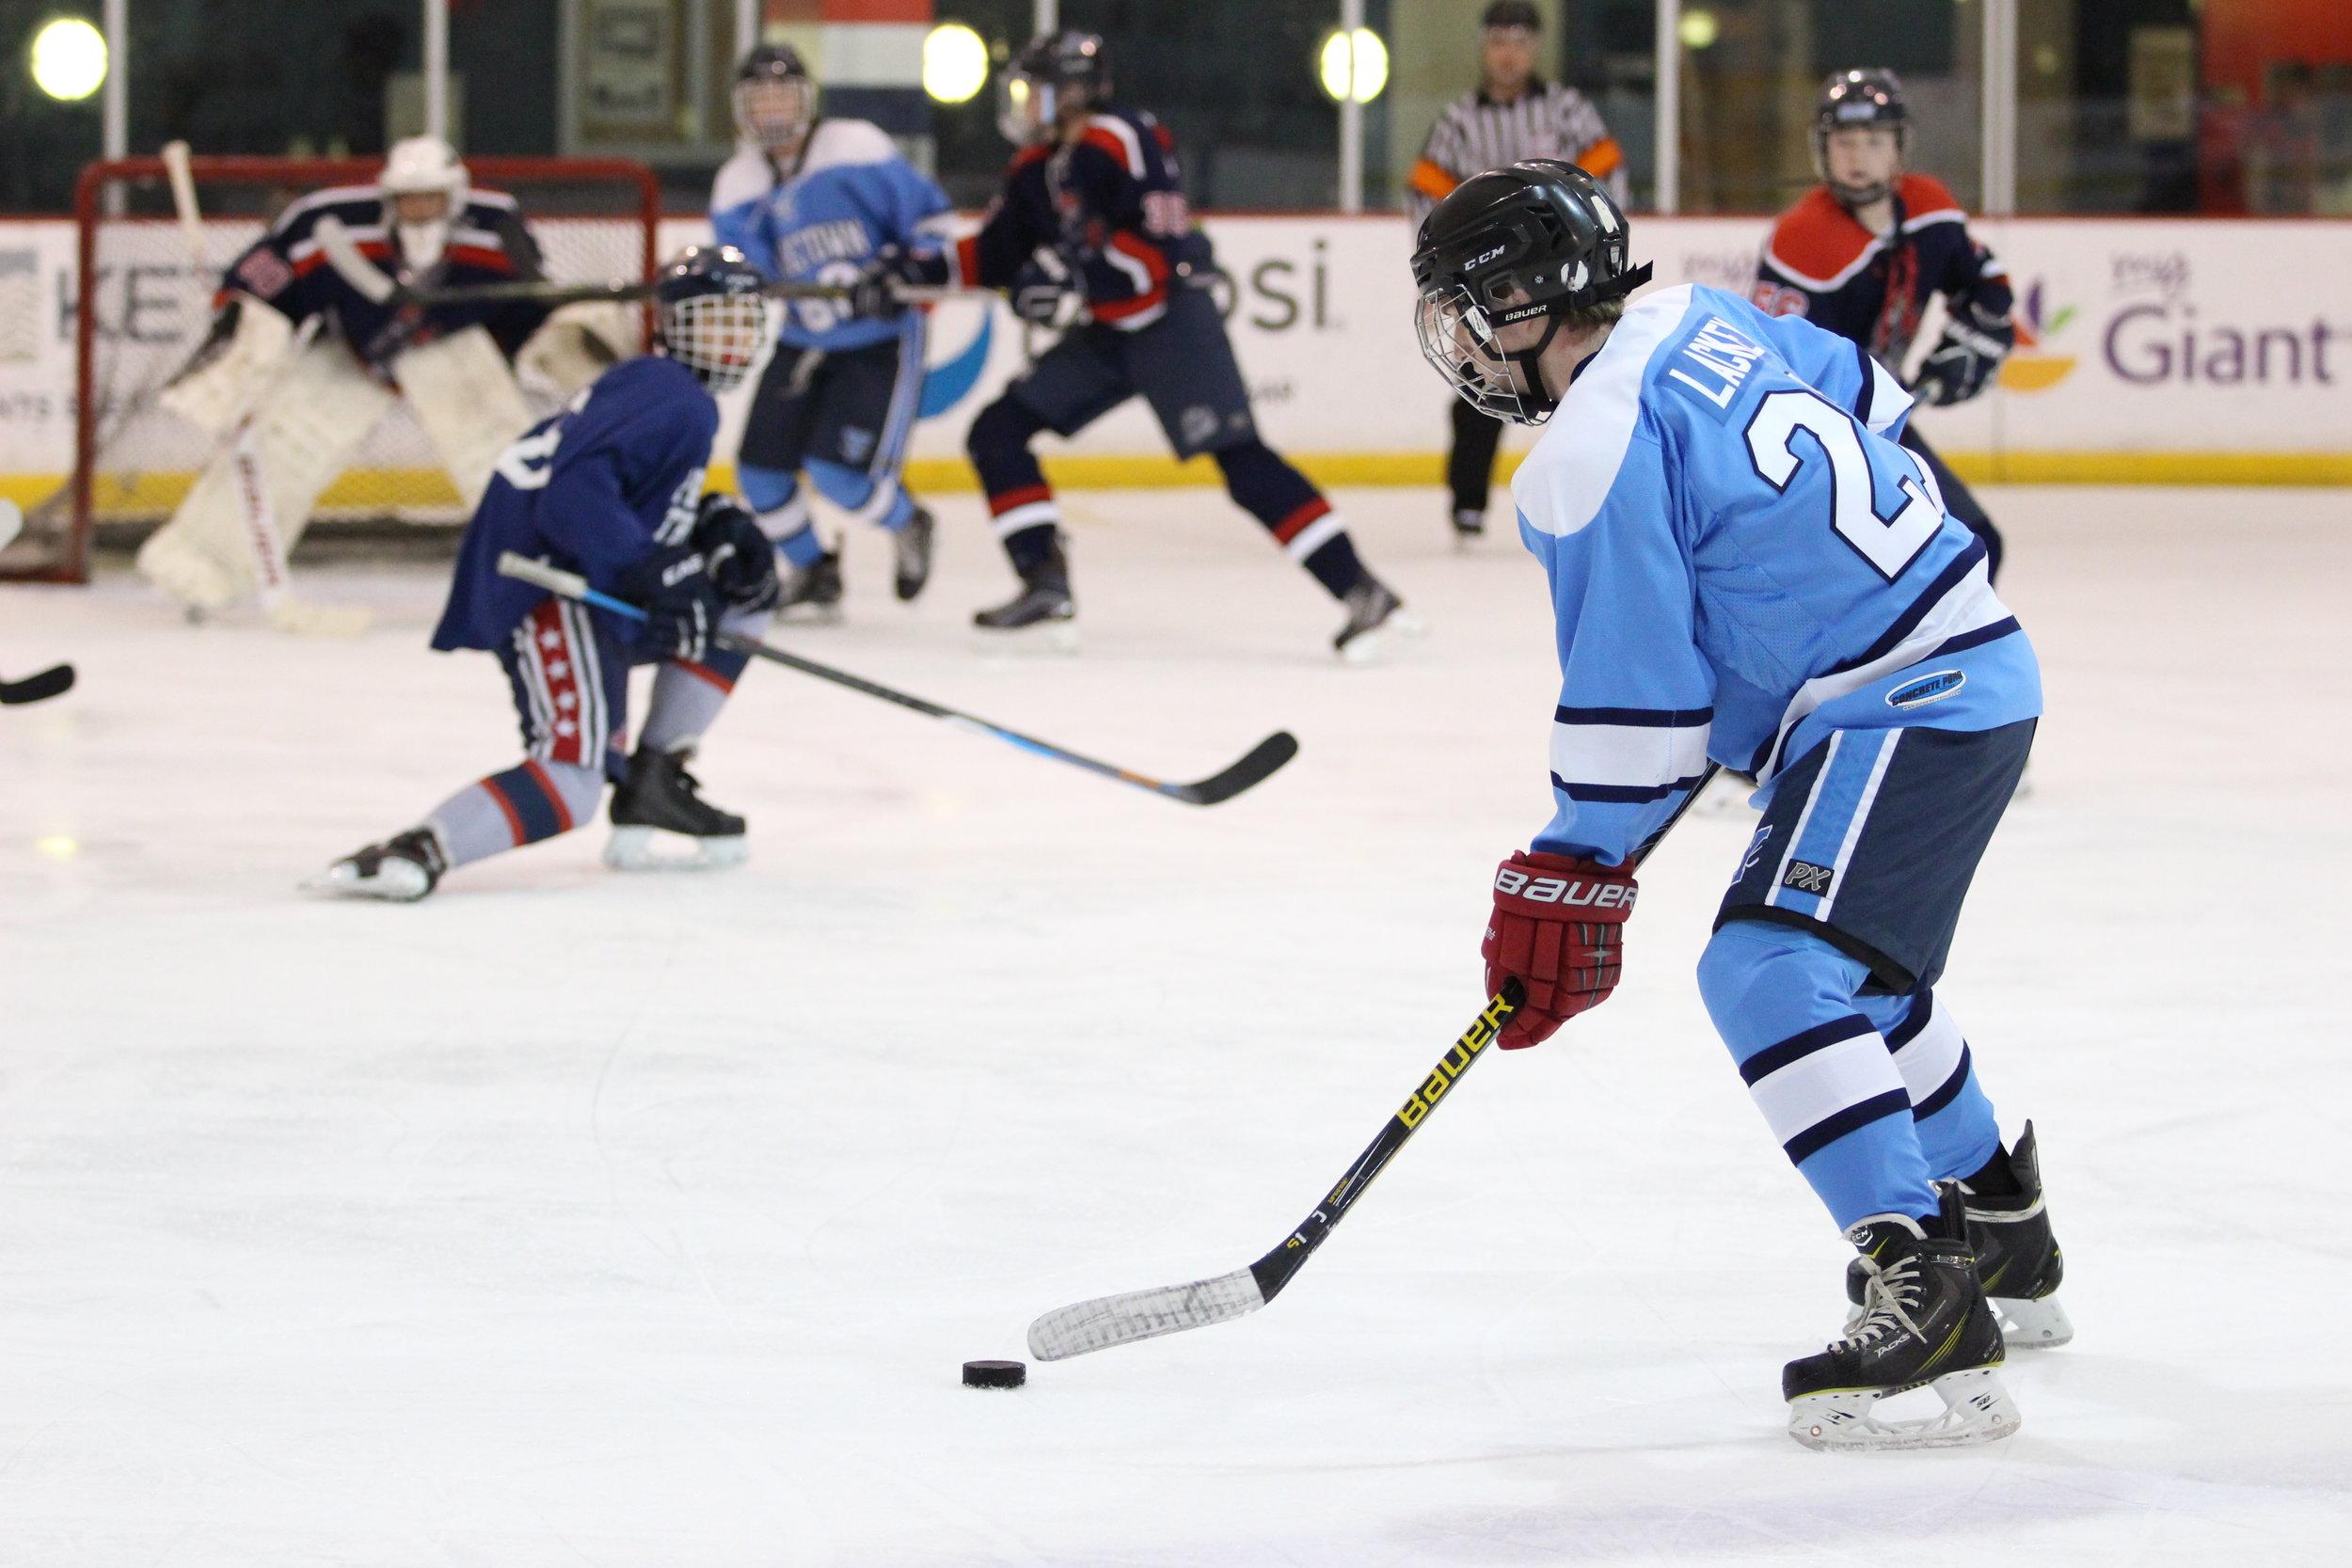 IMG_8864 LAckey taking a shot - good action.JPG